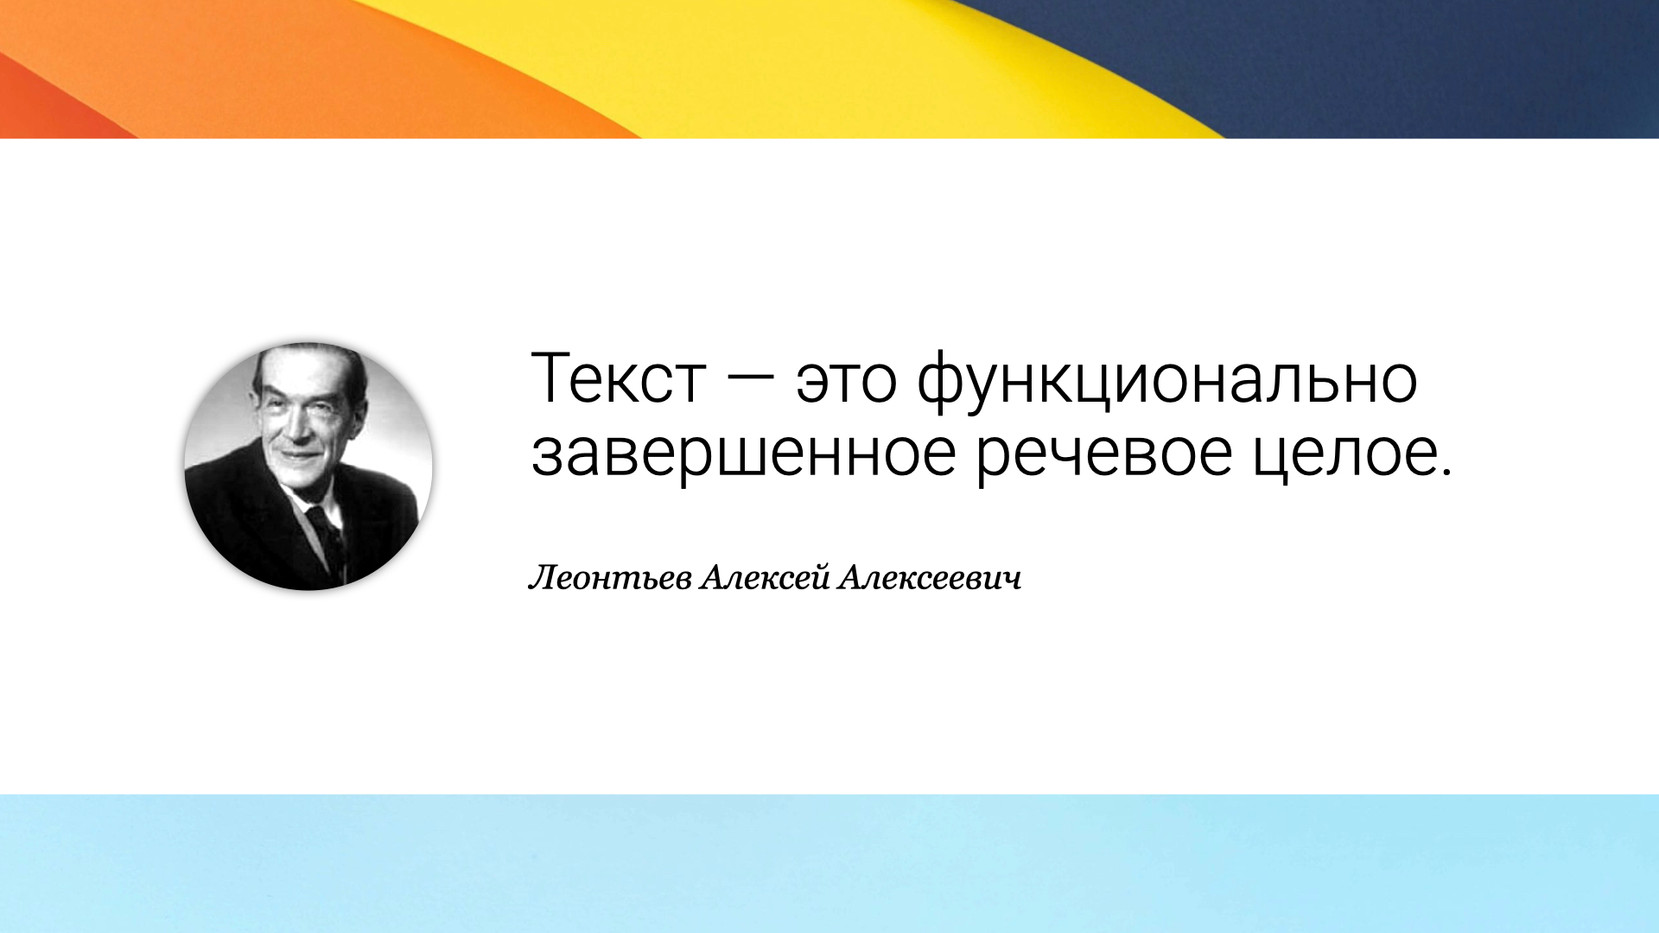 Леонтьев А.А.: